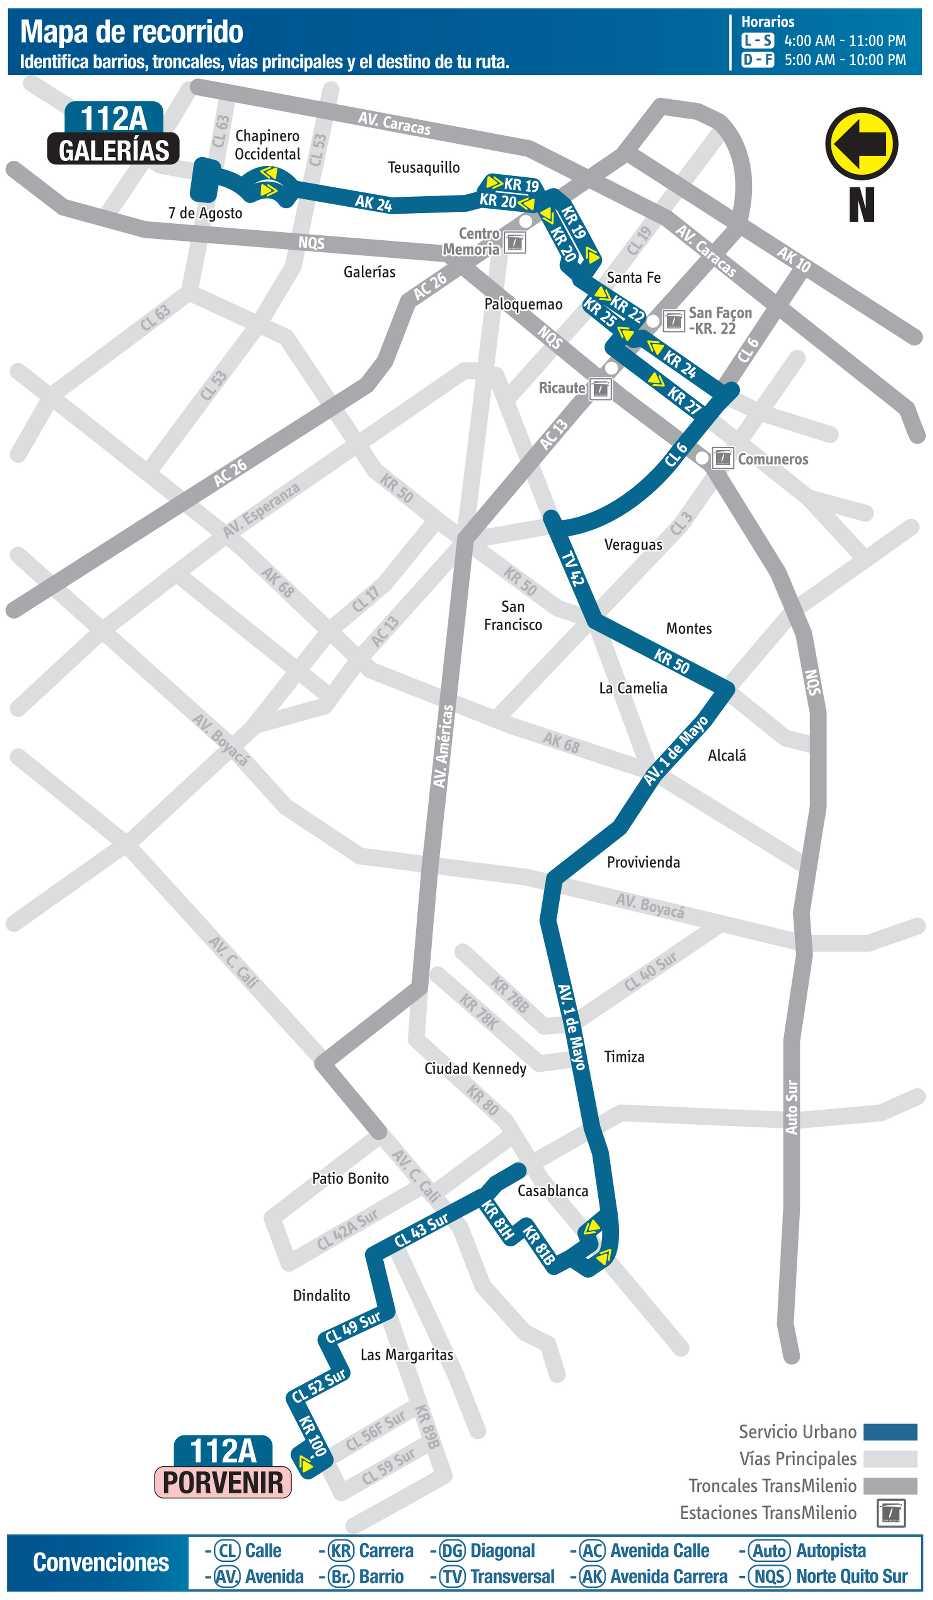 Ruta SITP: 112A > Galerías ↔ Porvernir (mapa)